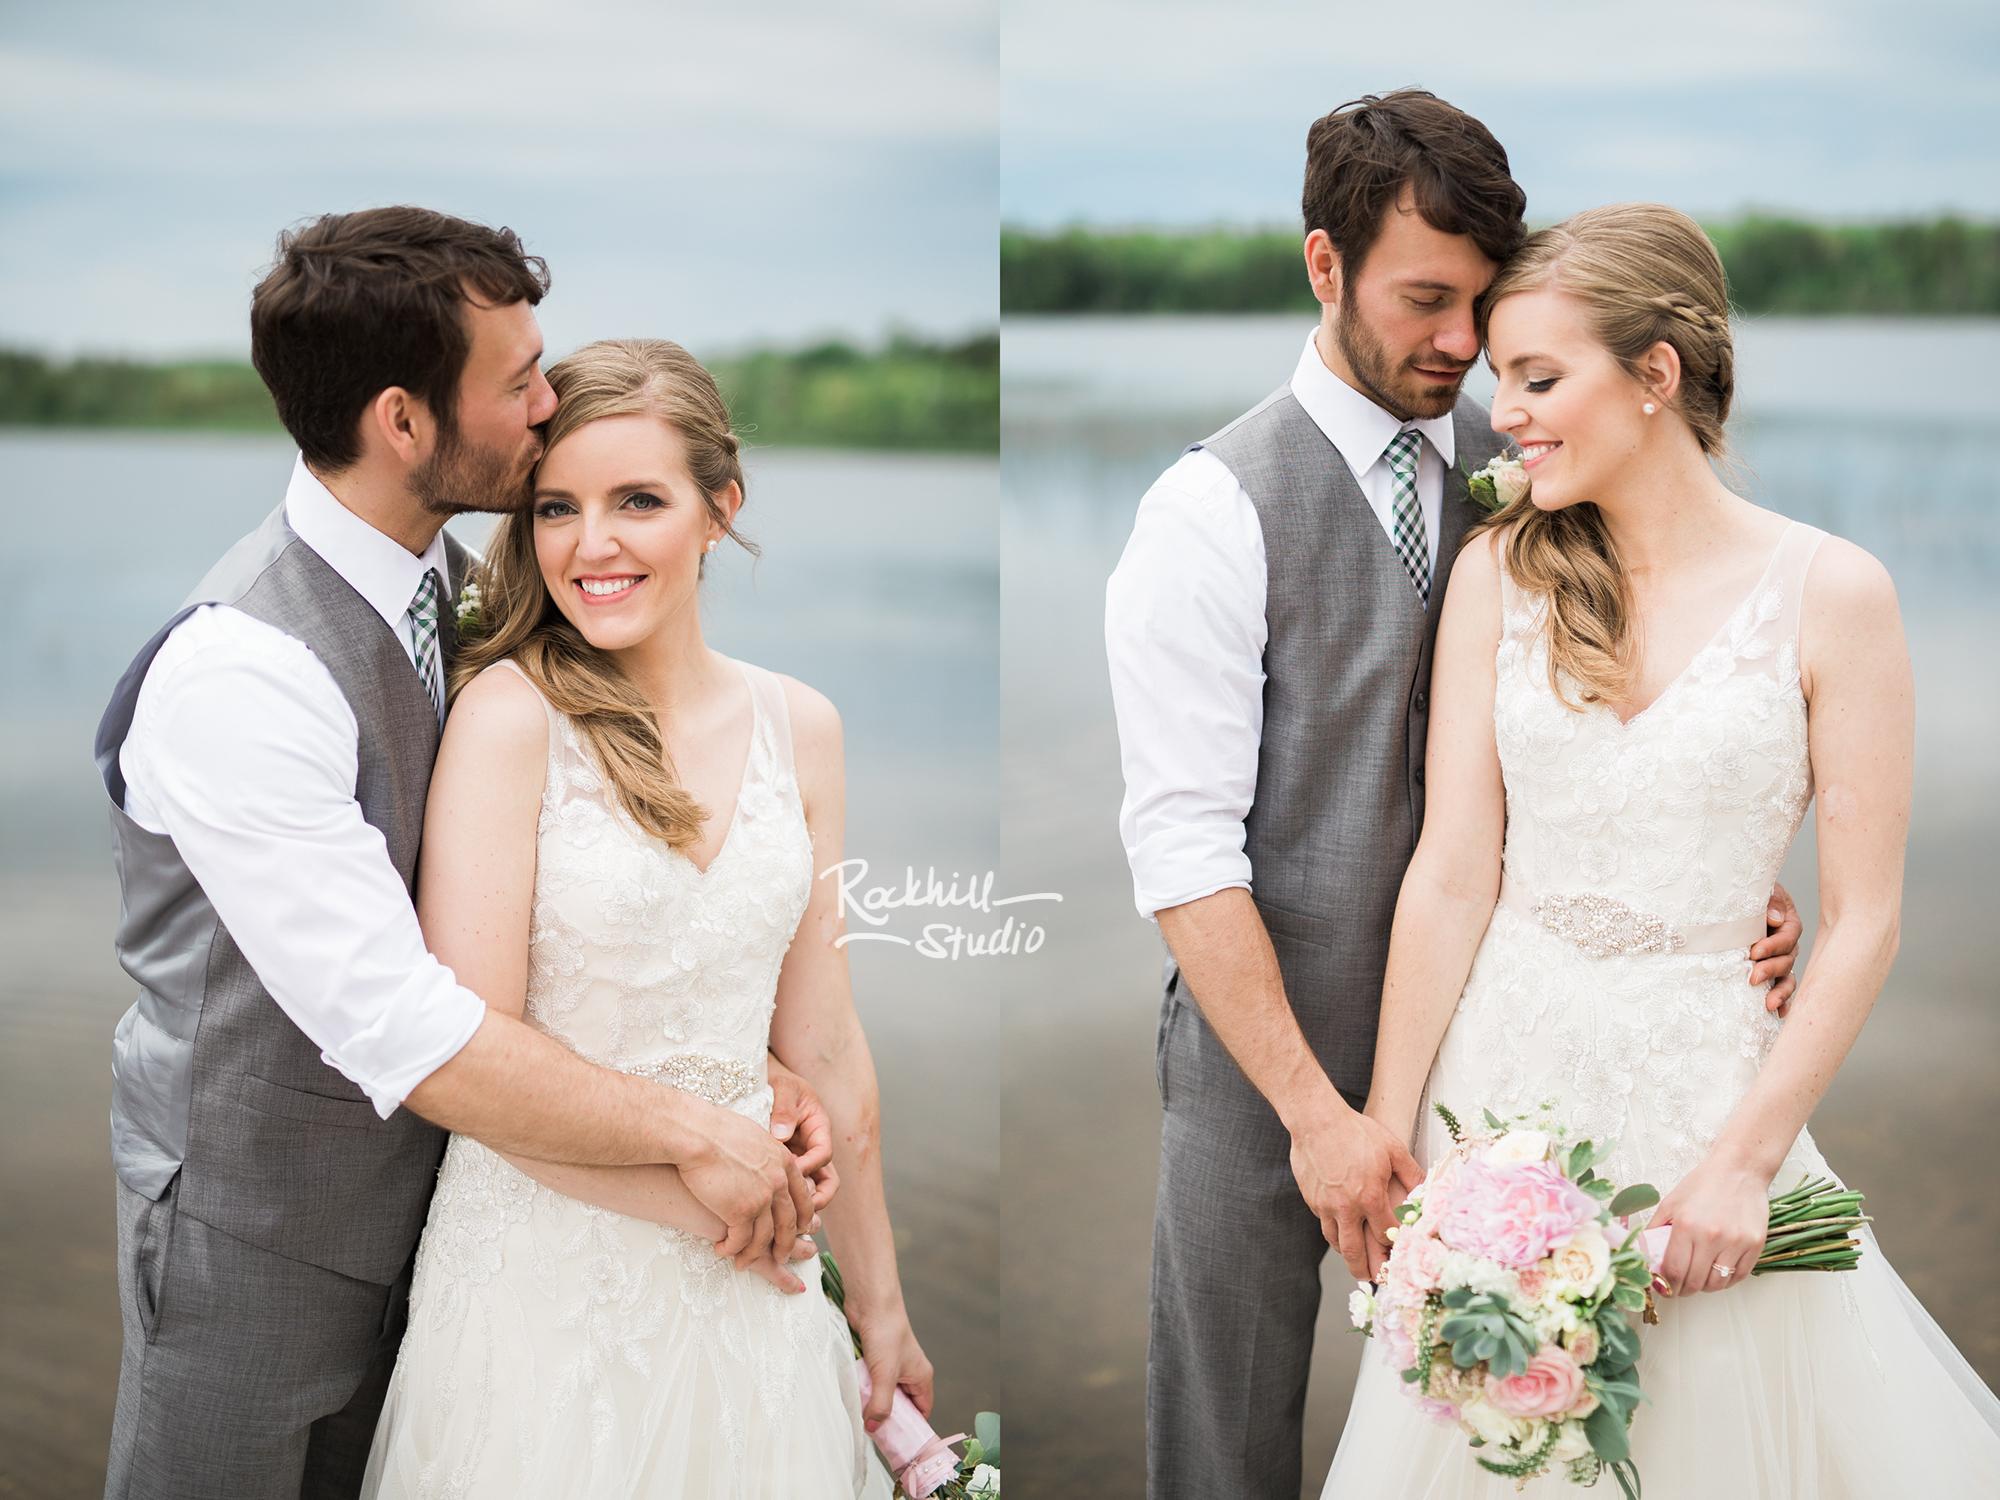 marquette-michigan-wedding-upper-peninsula-spring-photography-rockhill-ee-48.jpg